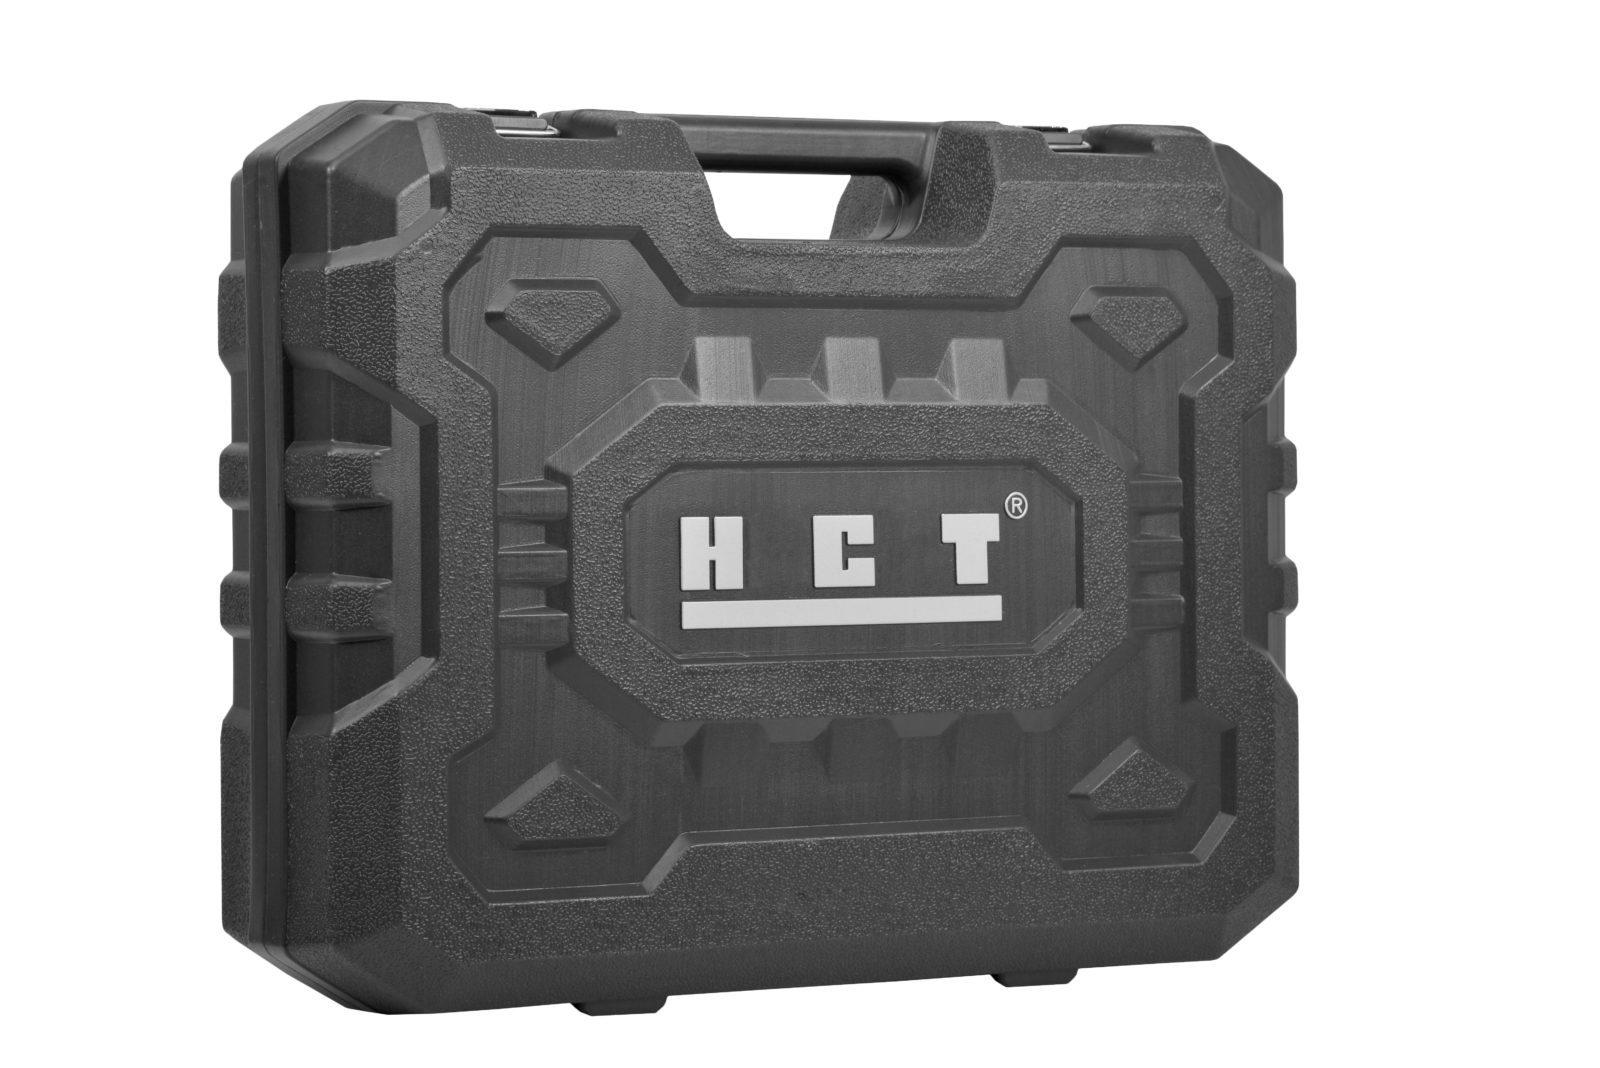 Martelo combinado 1600watt sds-max HCT PH 1069